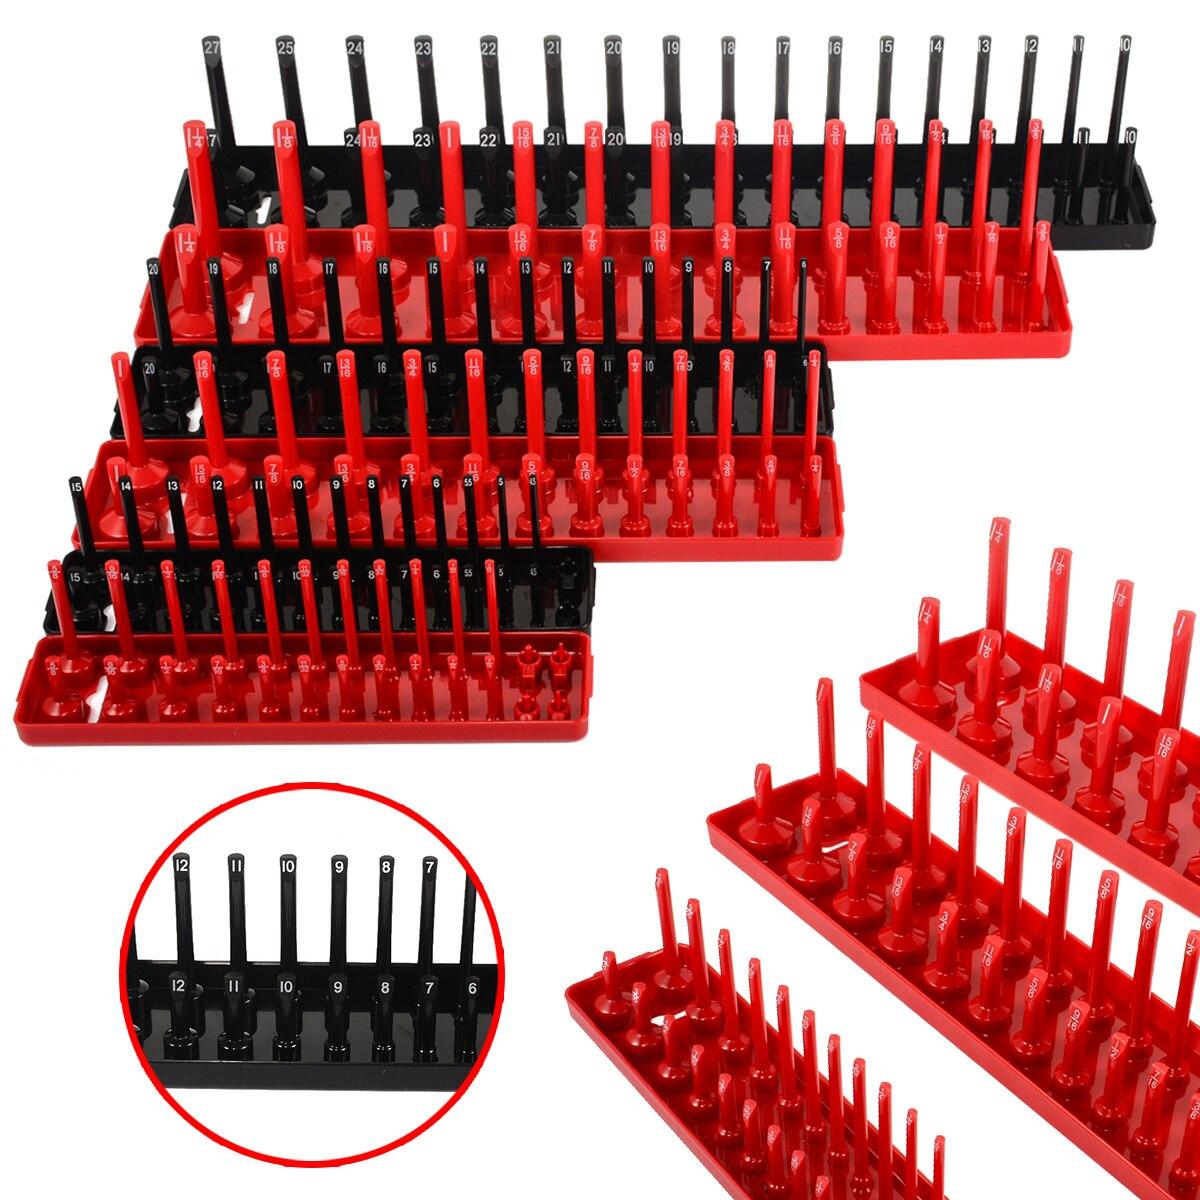 6pcs 1/4'' 3/8'' 1/2'' Plastic Organizer Accessories Shelf Stand Metric SAE Garage Storage Tool Rack Holder Home Socket Tray